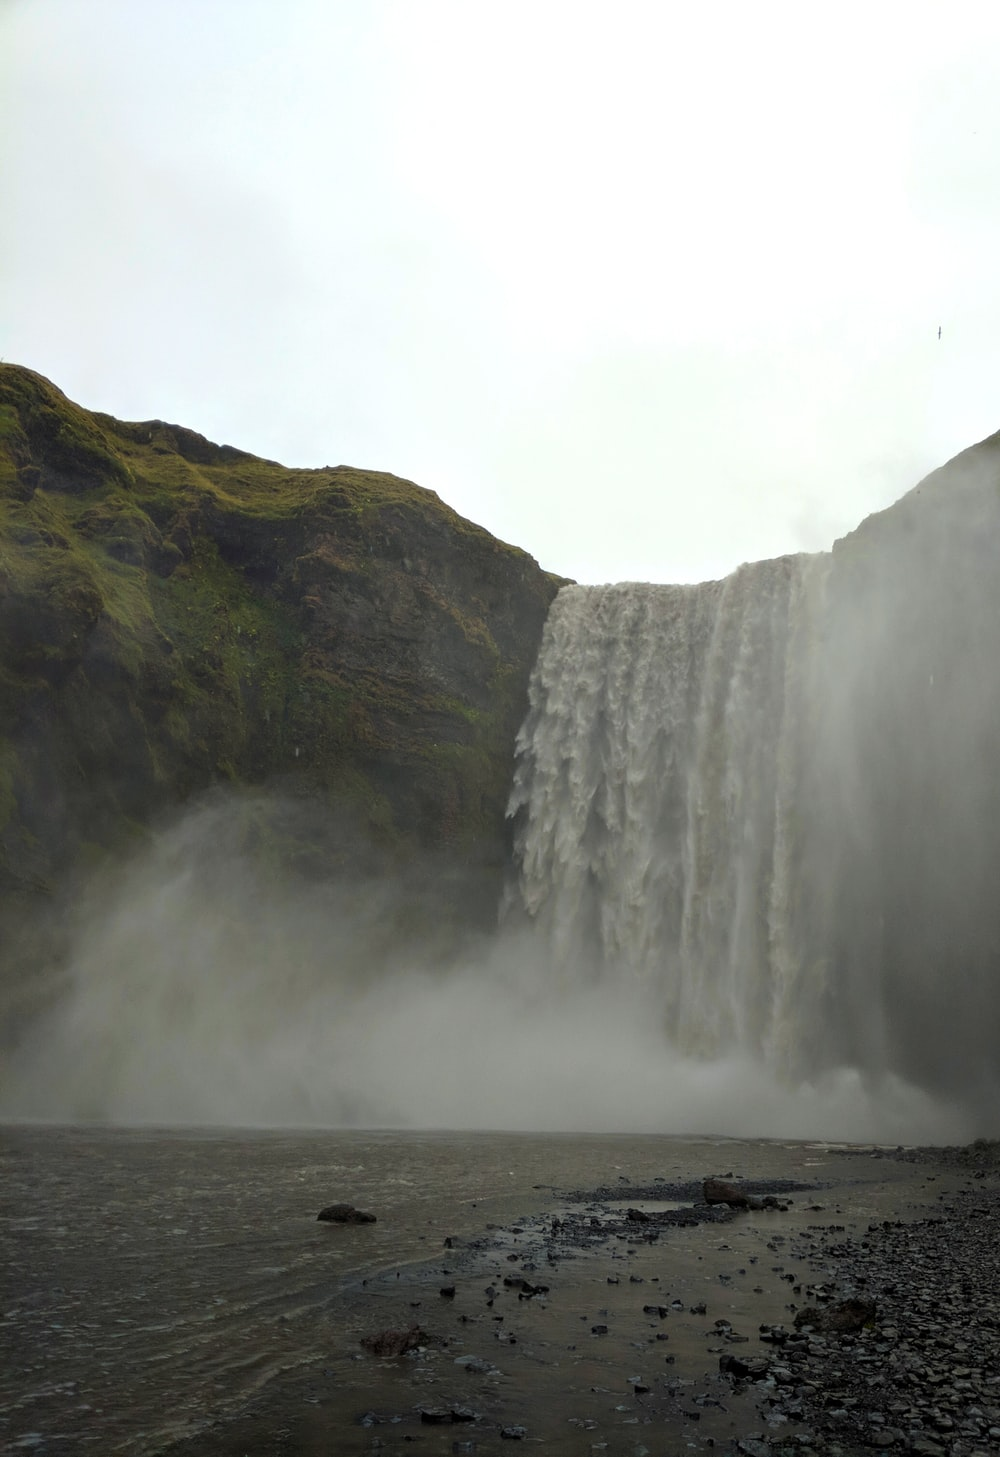 waterfalls on gray rocky mountain during daytime